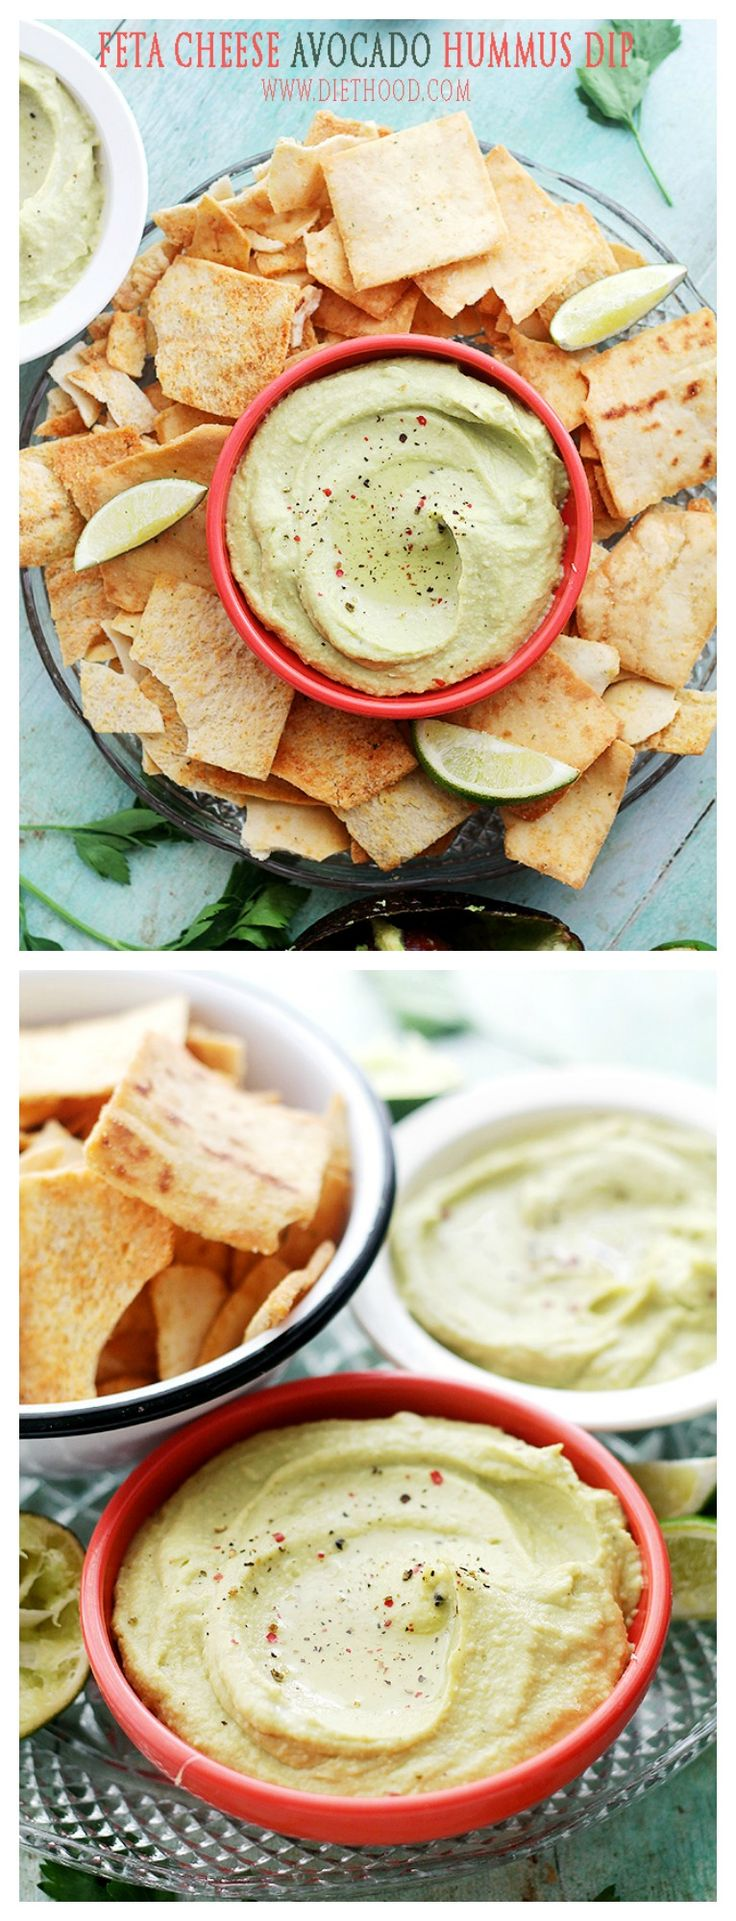 Feta Cheese and Avocado Hummus Dip